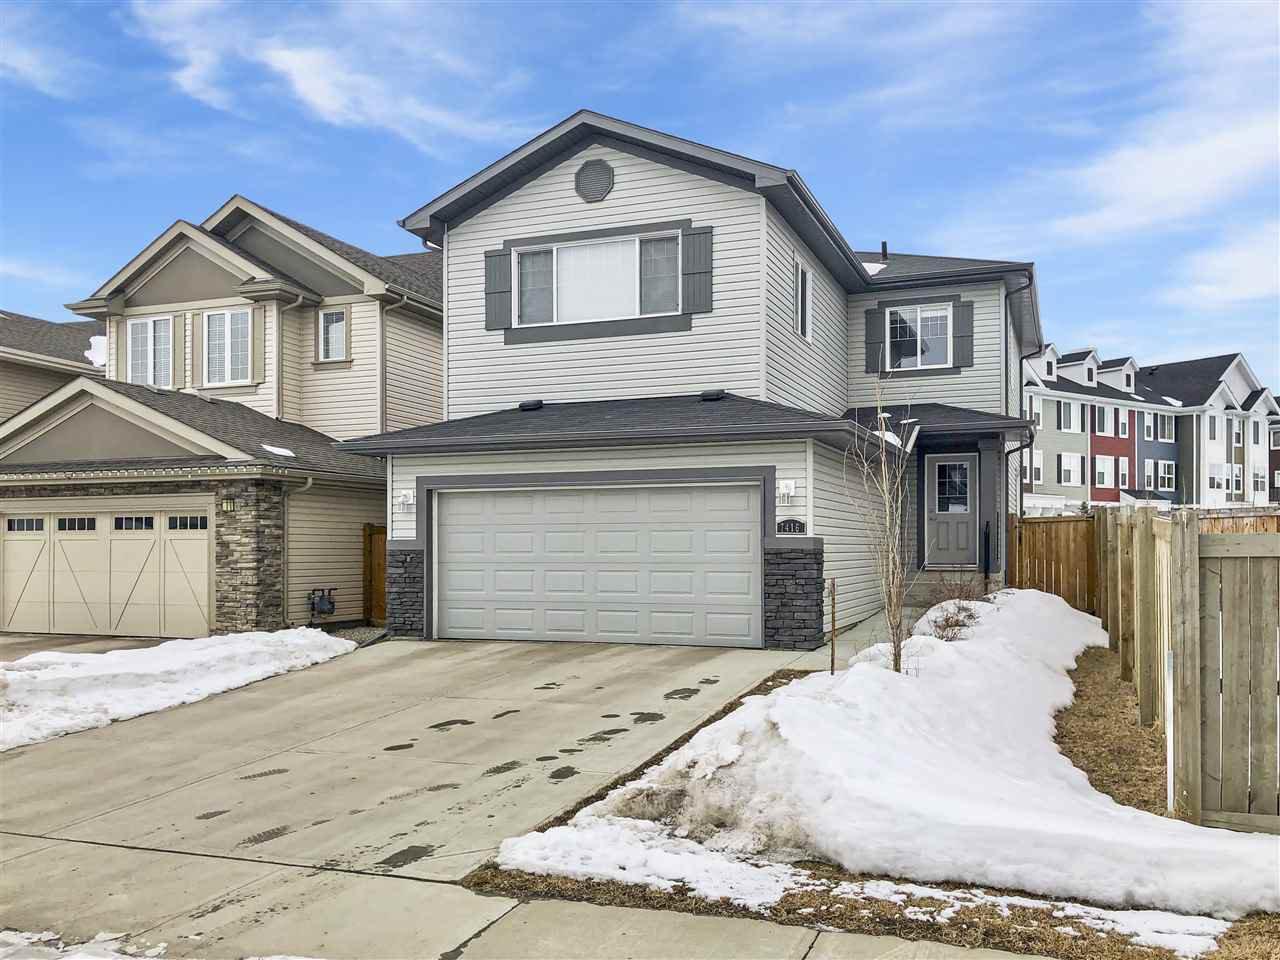 Main Photo: 7416 179 Avenue in Edmonton: Zone 28 House for sale : MLS®# E4191122